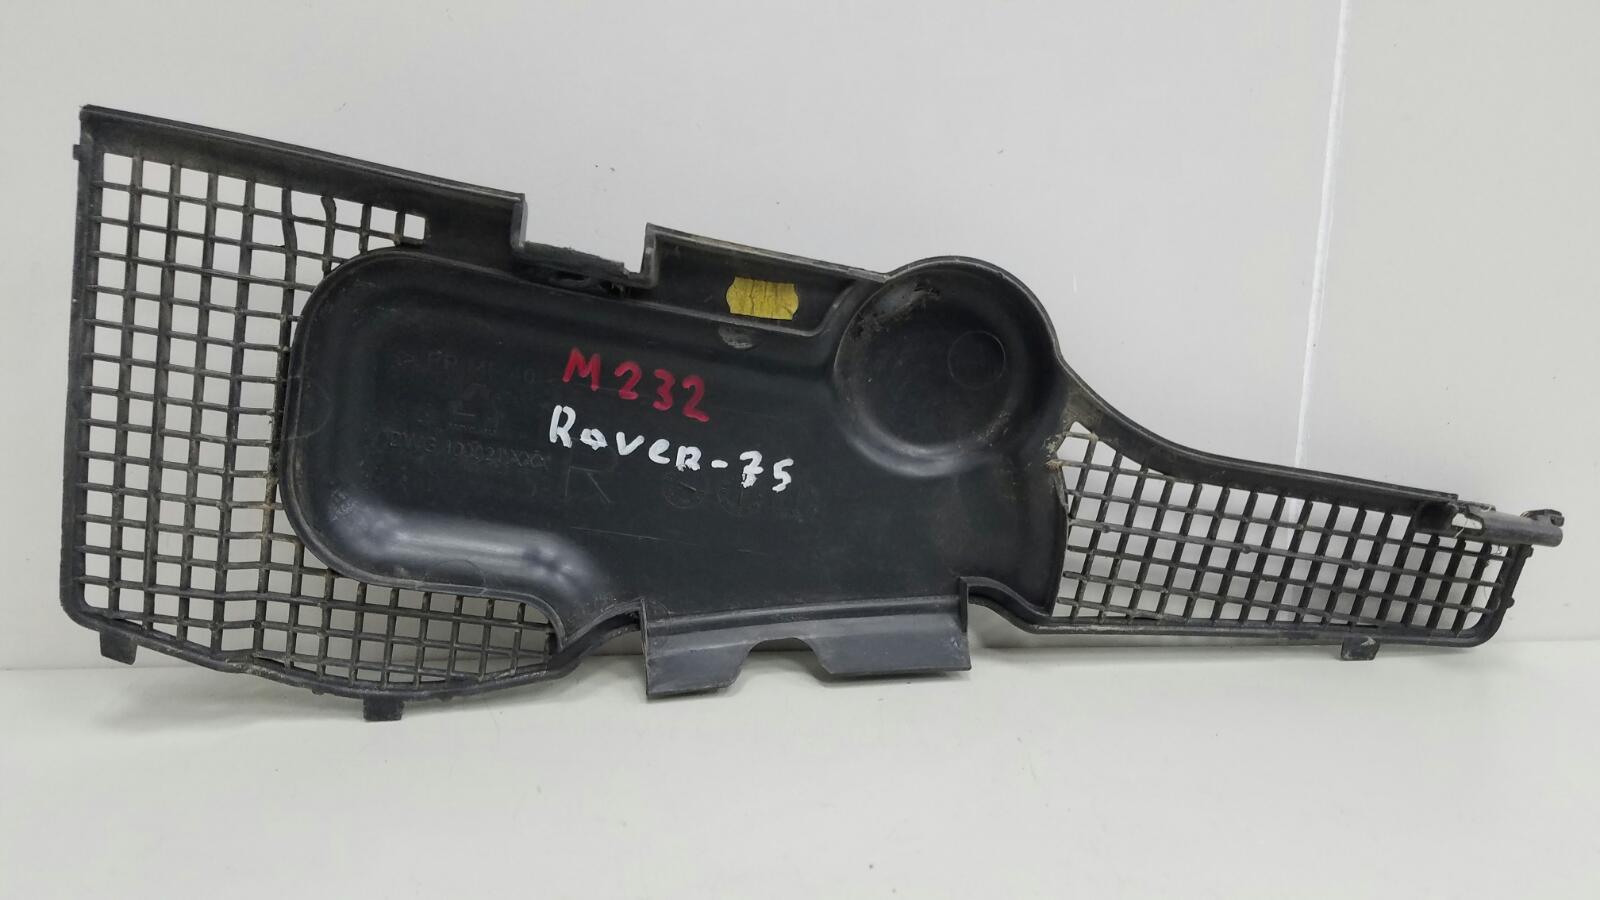 Накладка под лобовое стекло жабо Rover 75 RJ 18K4F 1.8Л 2000